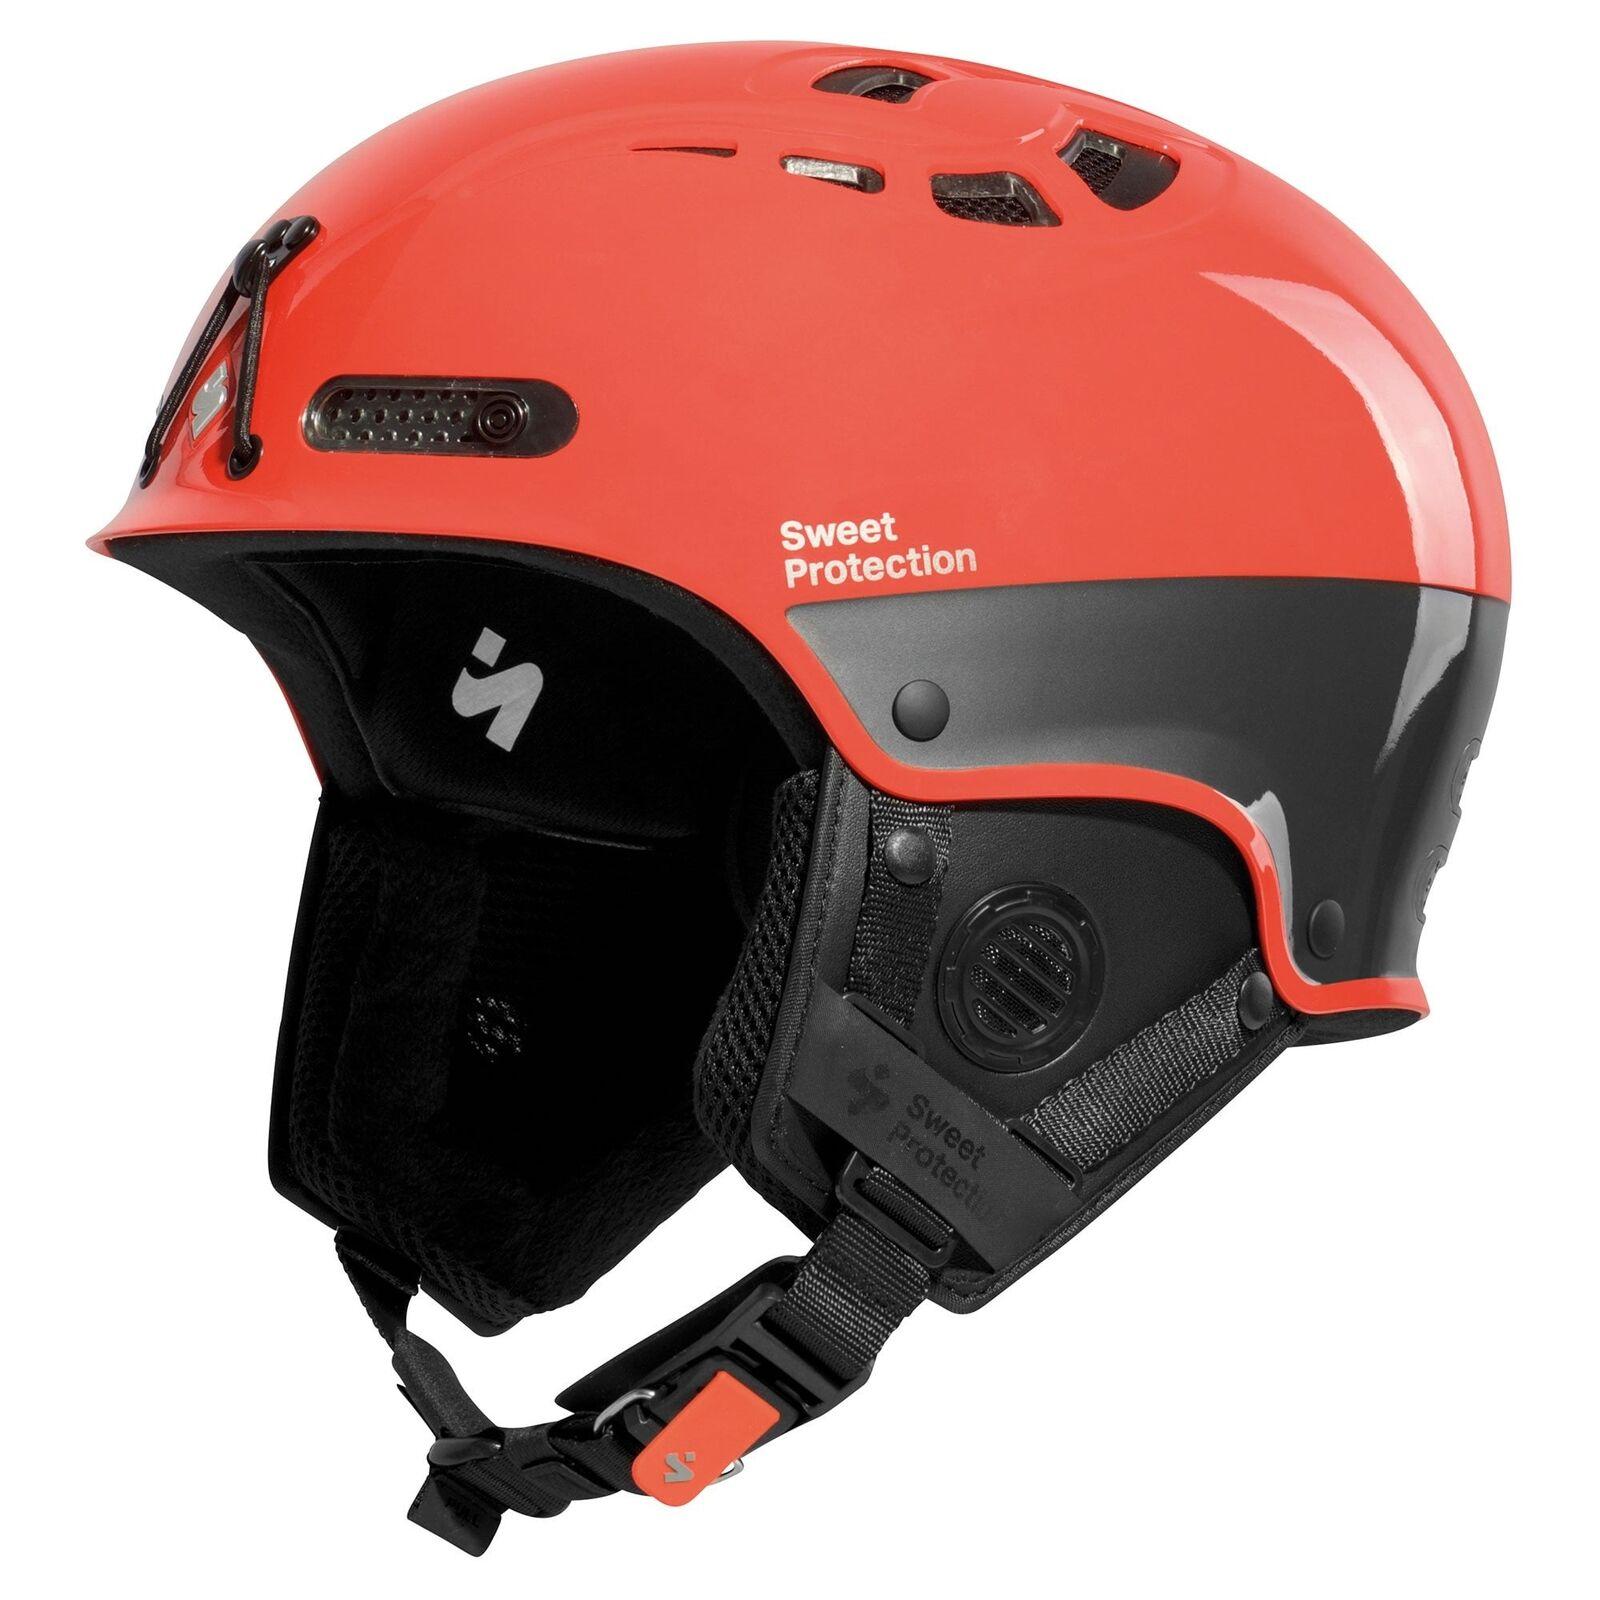 Sweet Predection Igniter Alpiniste II Ski Helmet - Gloss Cody orange